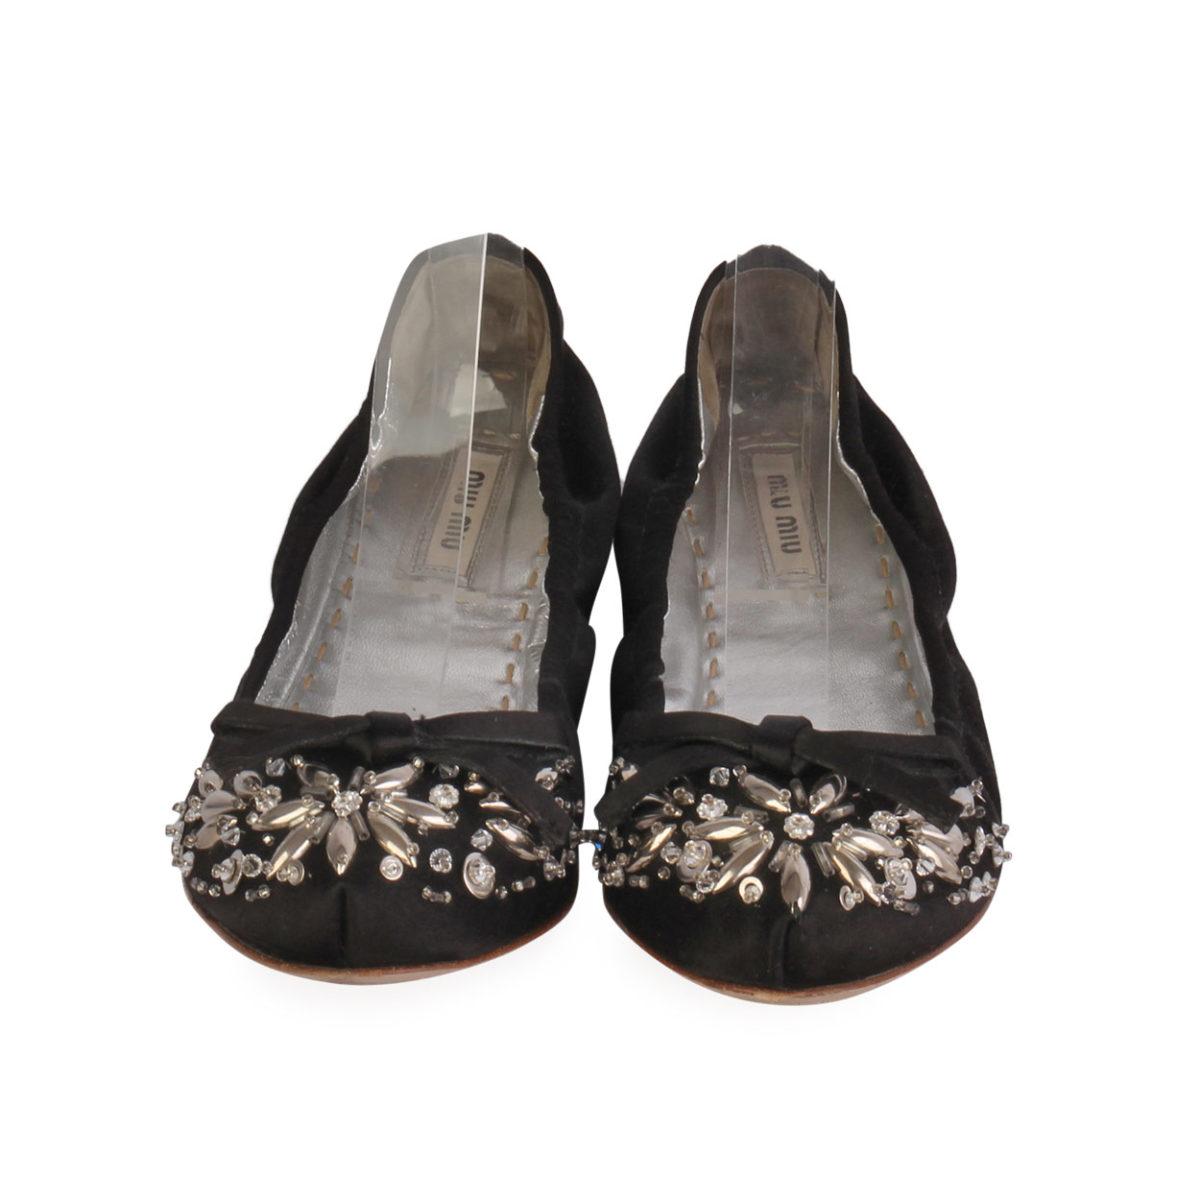 7e3be9aee0c MIU MIU Satin Crystal Embellished Ballet Pumps Black - S  38.5 (5.5 ...